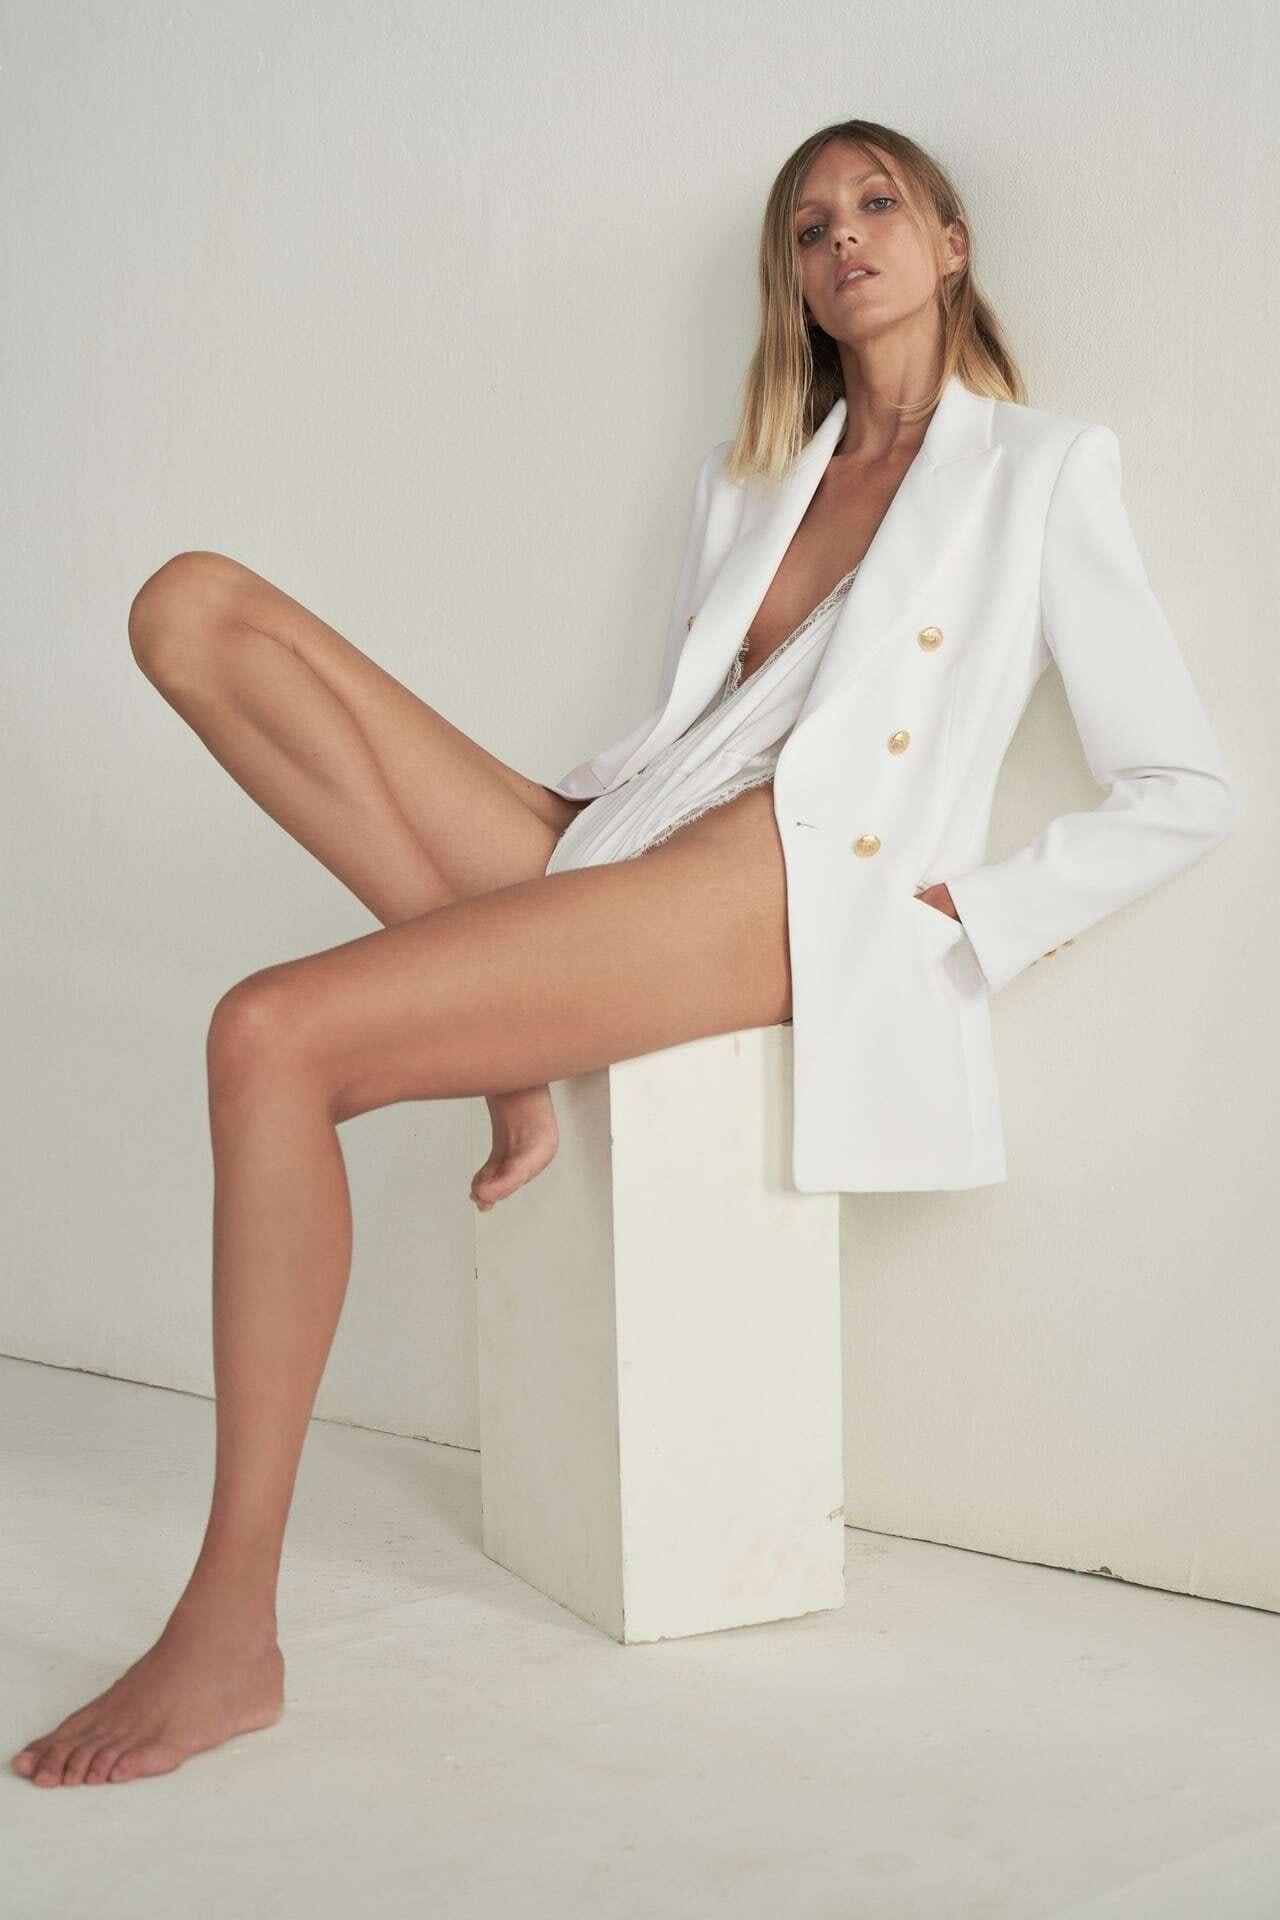 mulher vestida com blazer branco da Zara